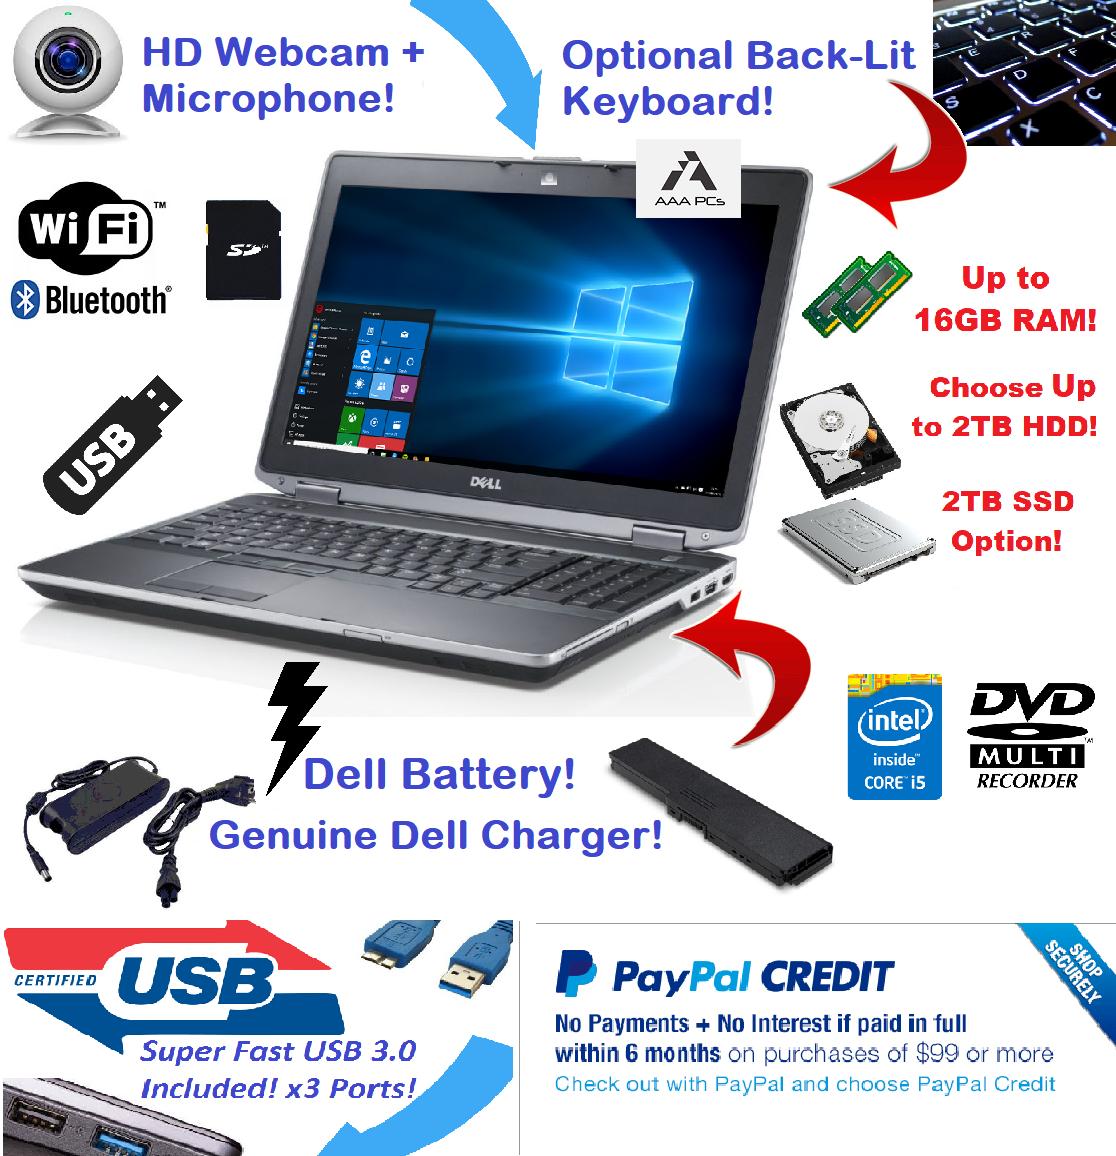 "Laptop Windows - Dell Latitude Laptop 15.6"" Intel i5 2TB SSD 🚩16GB RAM 🎮 WiFI HDMI + Win10 Pro"